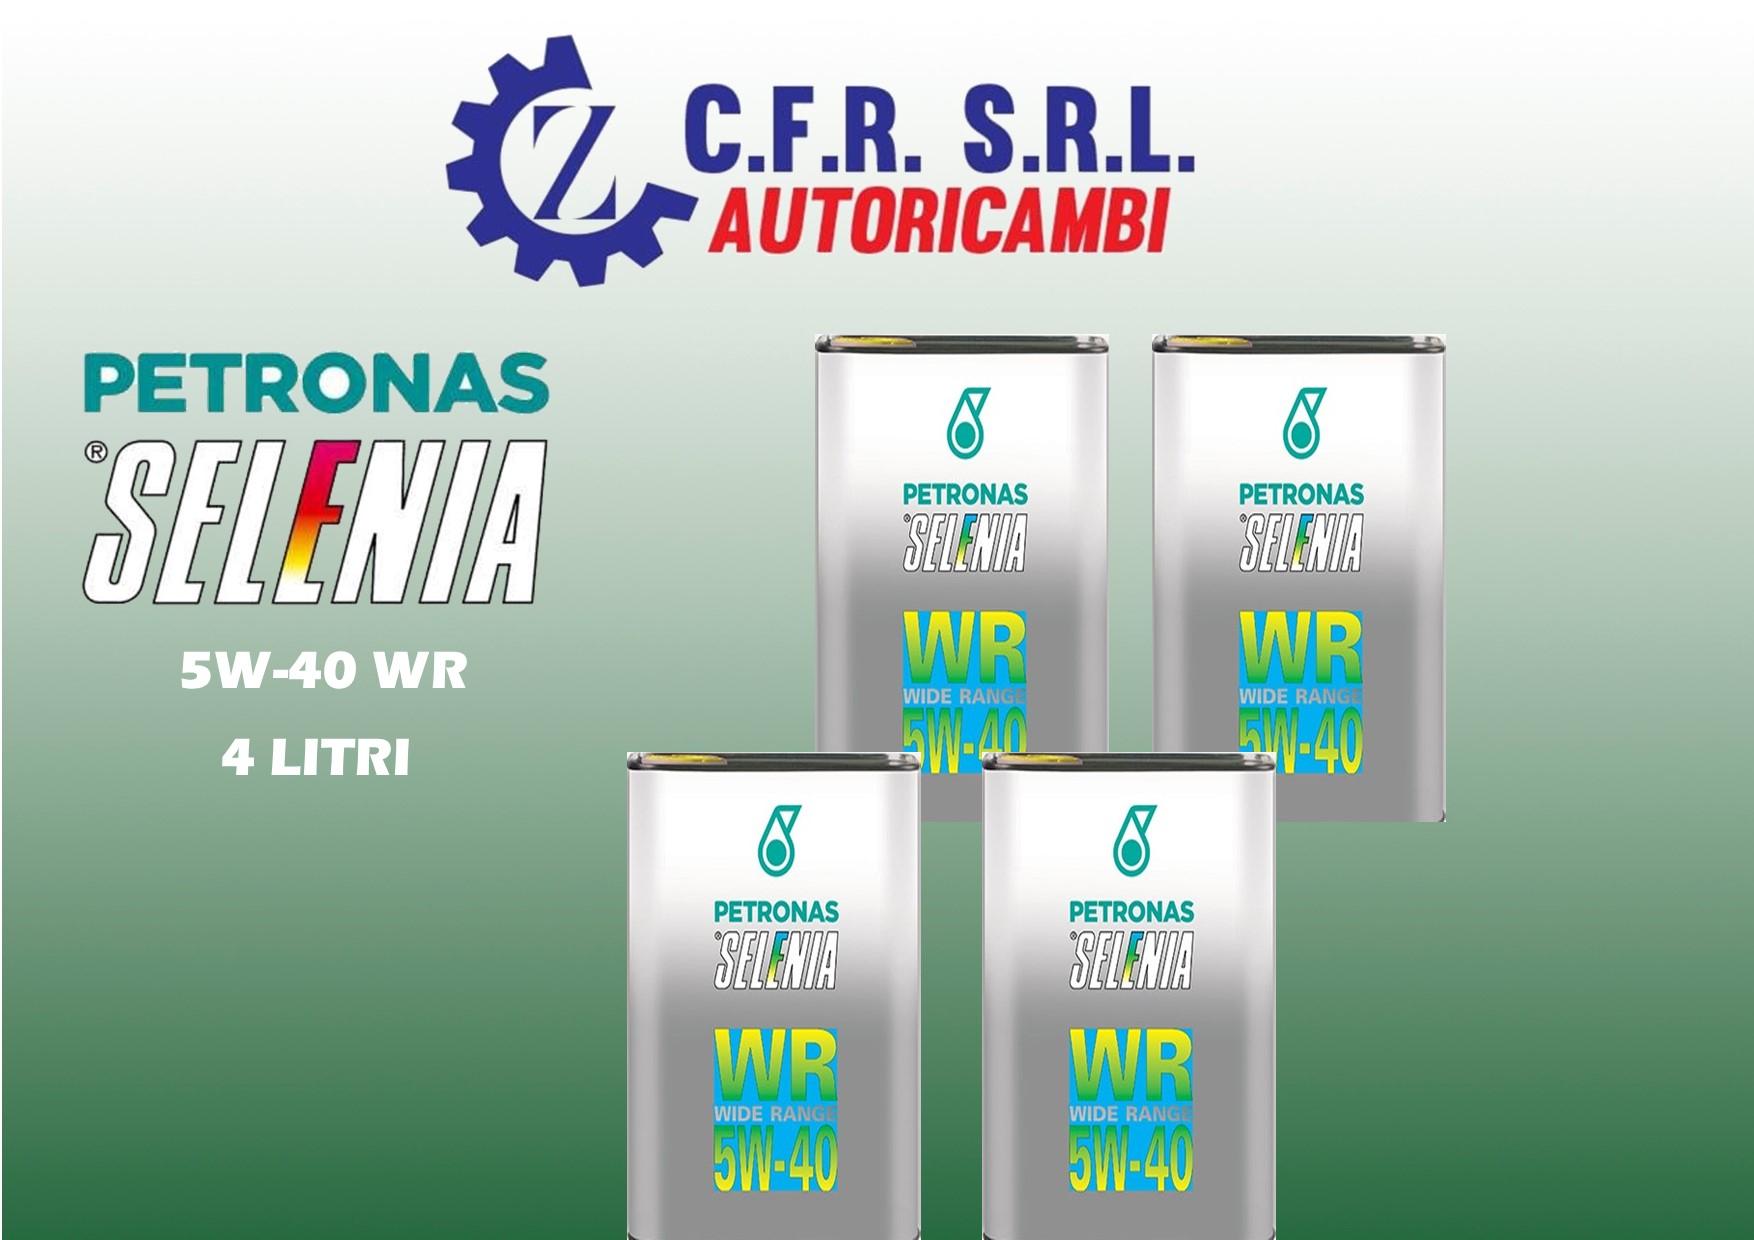 4PZ OLIO LUBRIFICANTE SELENIA WR 5W-40